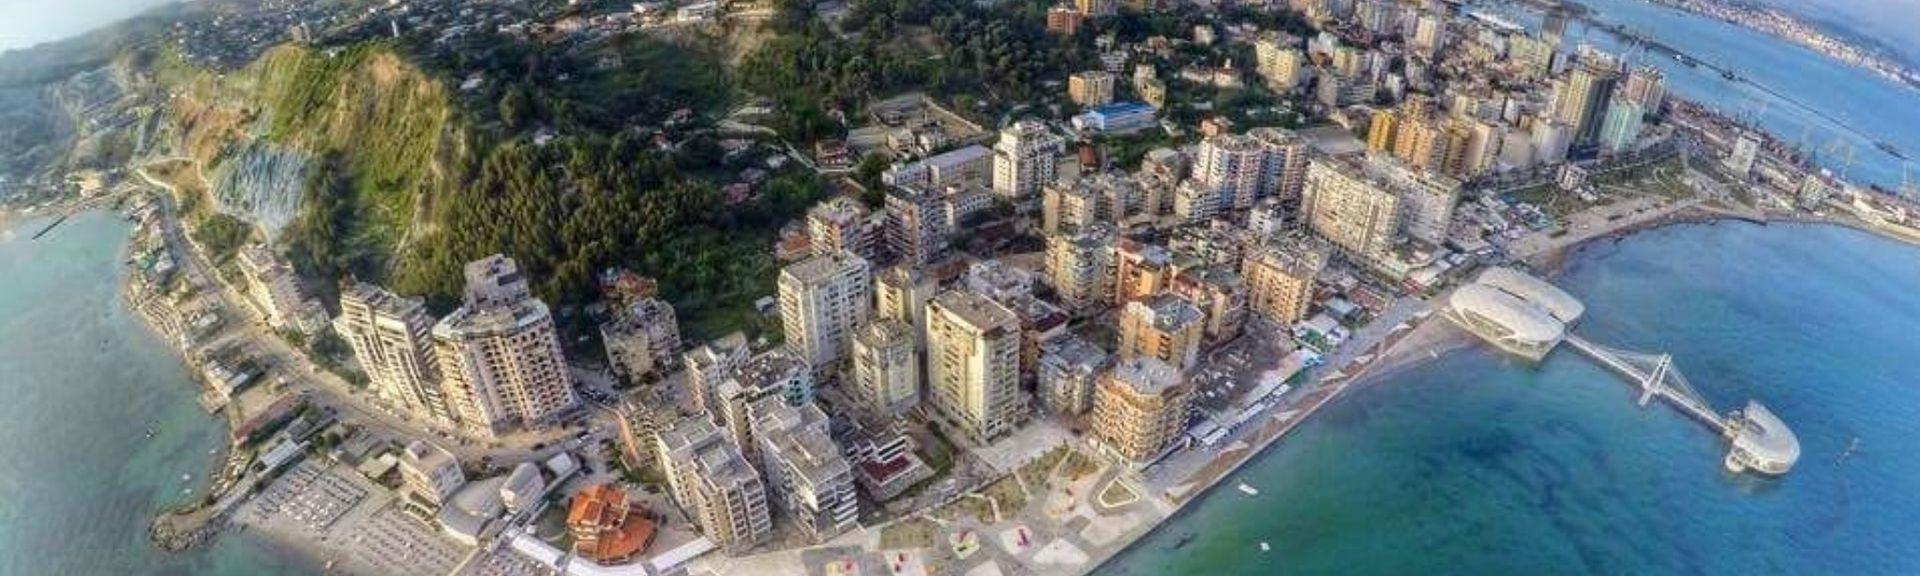 Ministère de la Justice, Tirana, Elbasan, Albanie